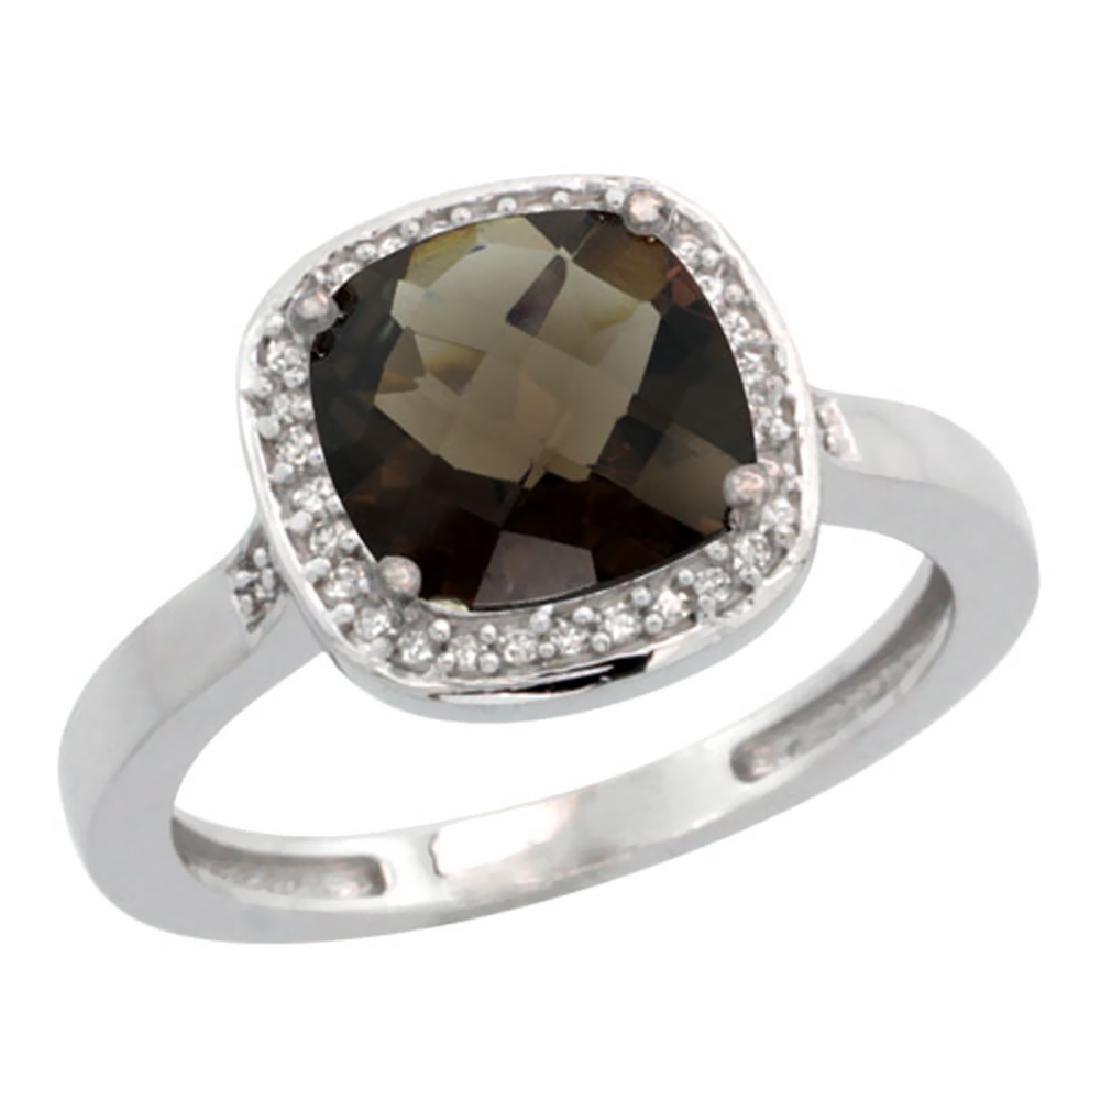 Natural 3.94 ctw Smoky-topaz & Diamond Engagement Ring